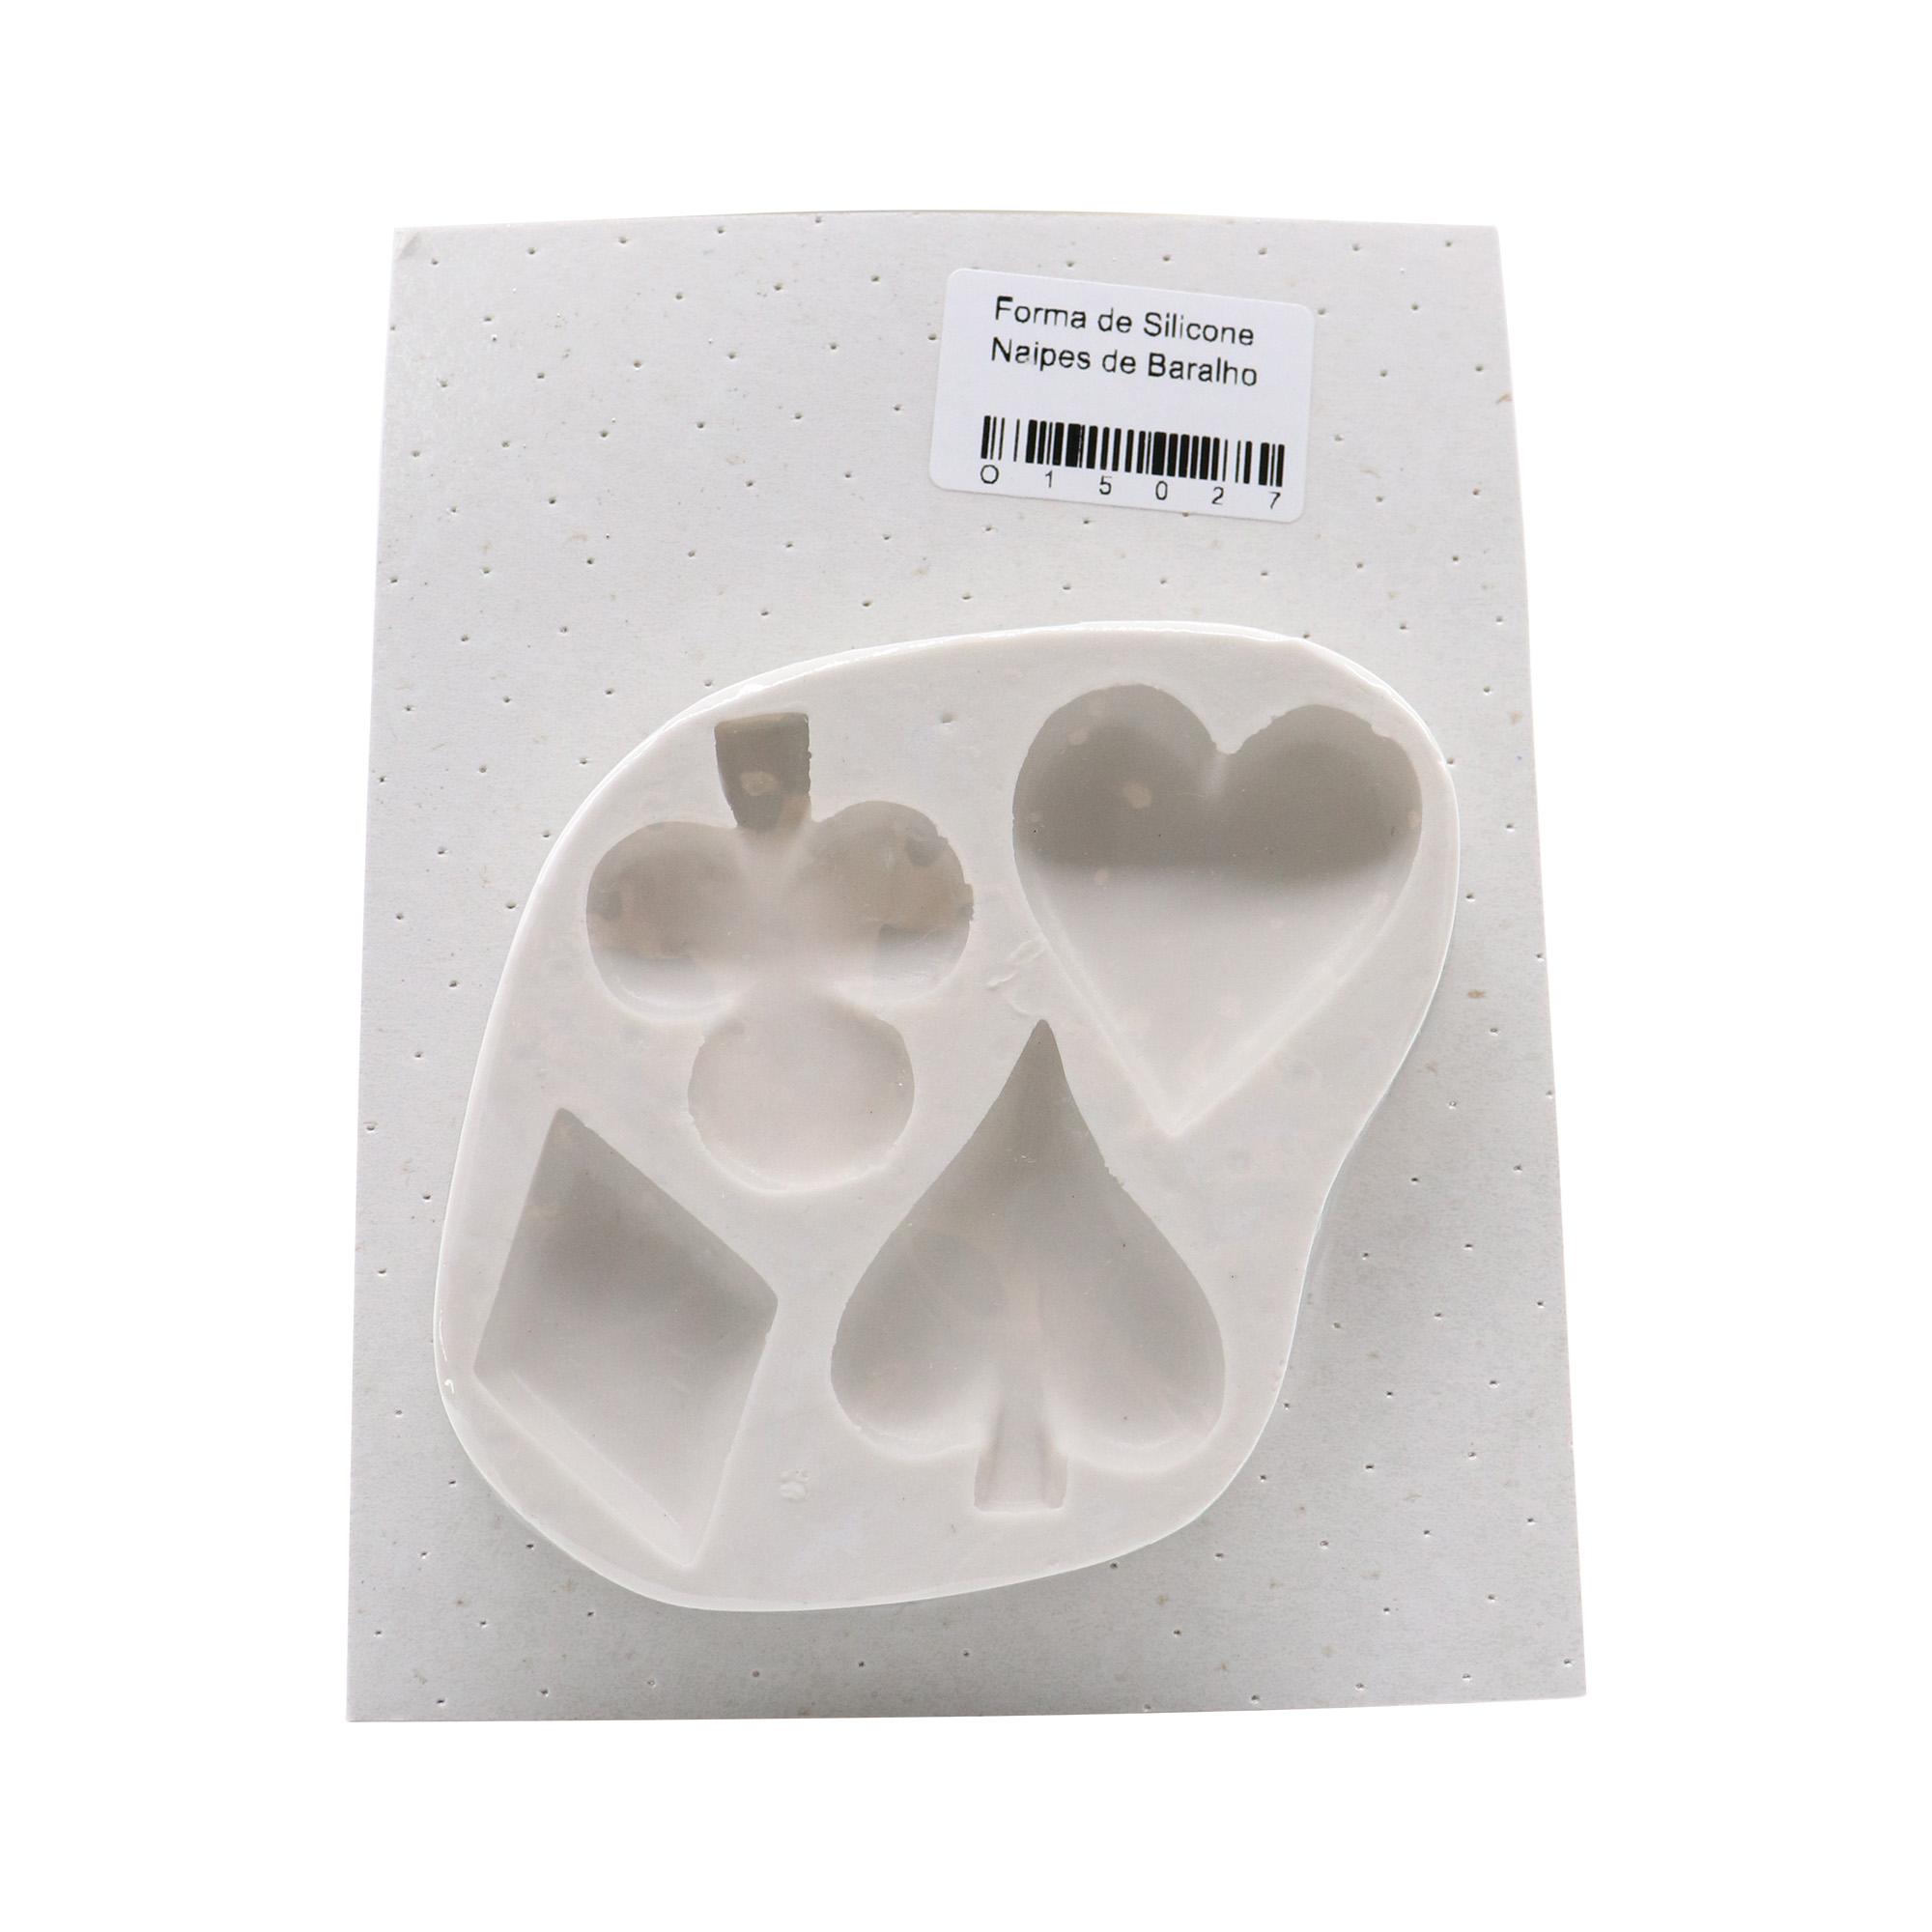 Molde de silicone Naipes de baralho